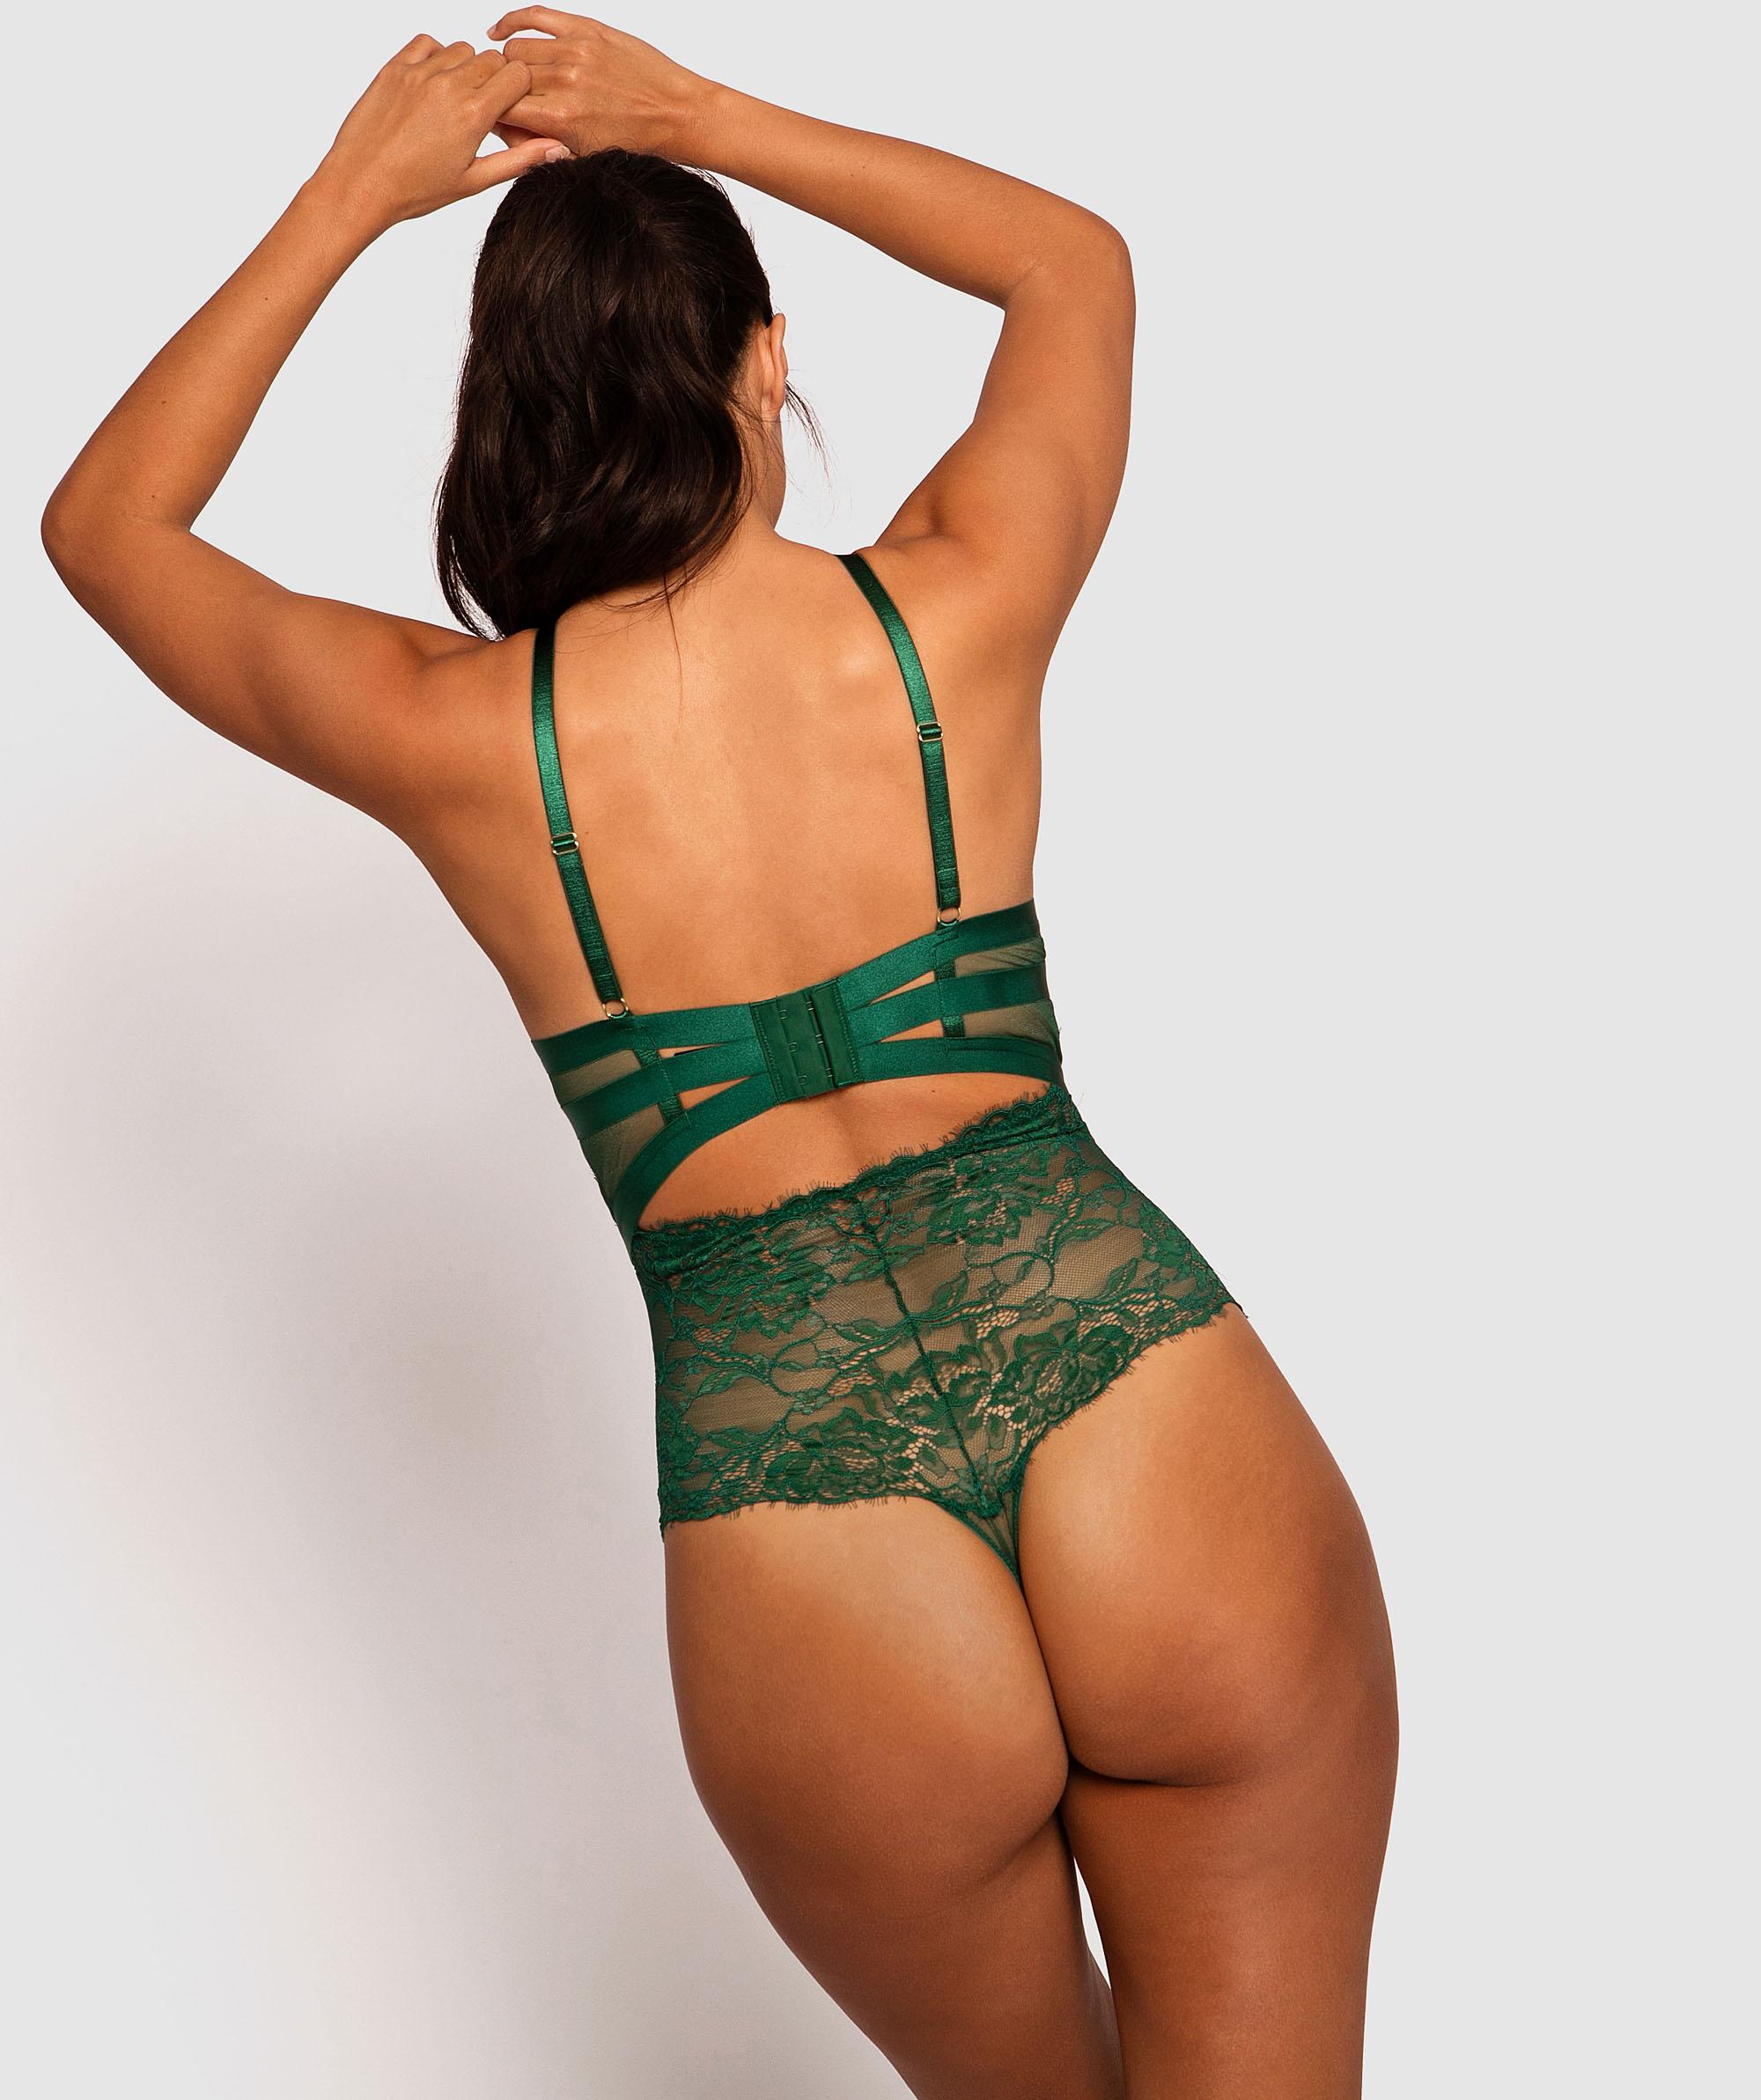 Shiloh Soft Cup Bodysuit - Dark Green